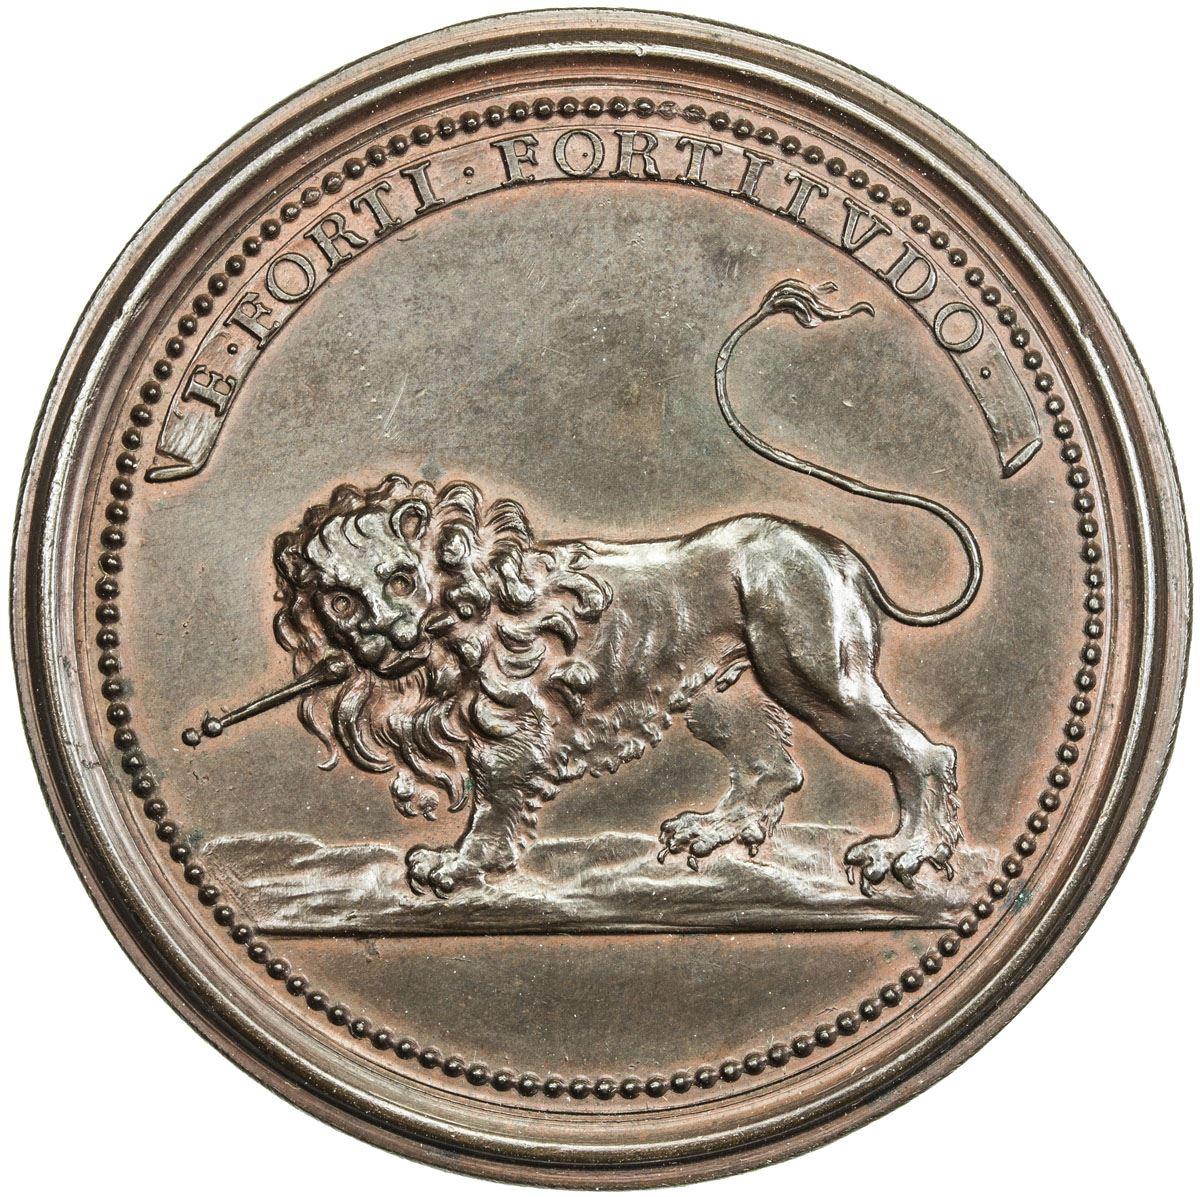 Lorraine Ae Medal 3874g Nd Ca 1730 Unc